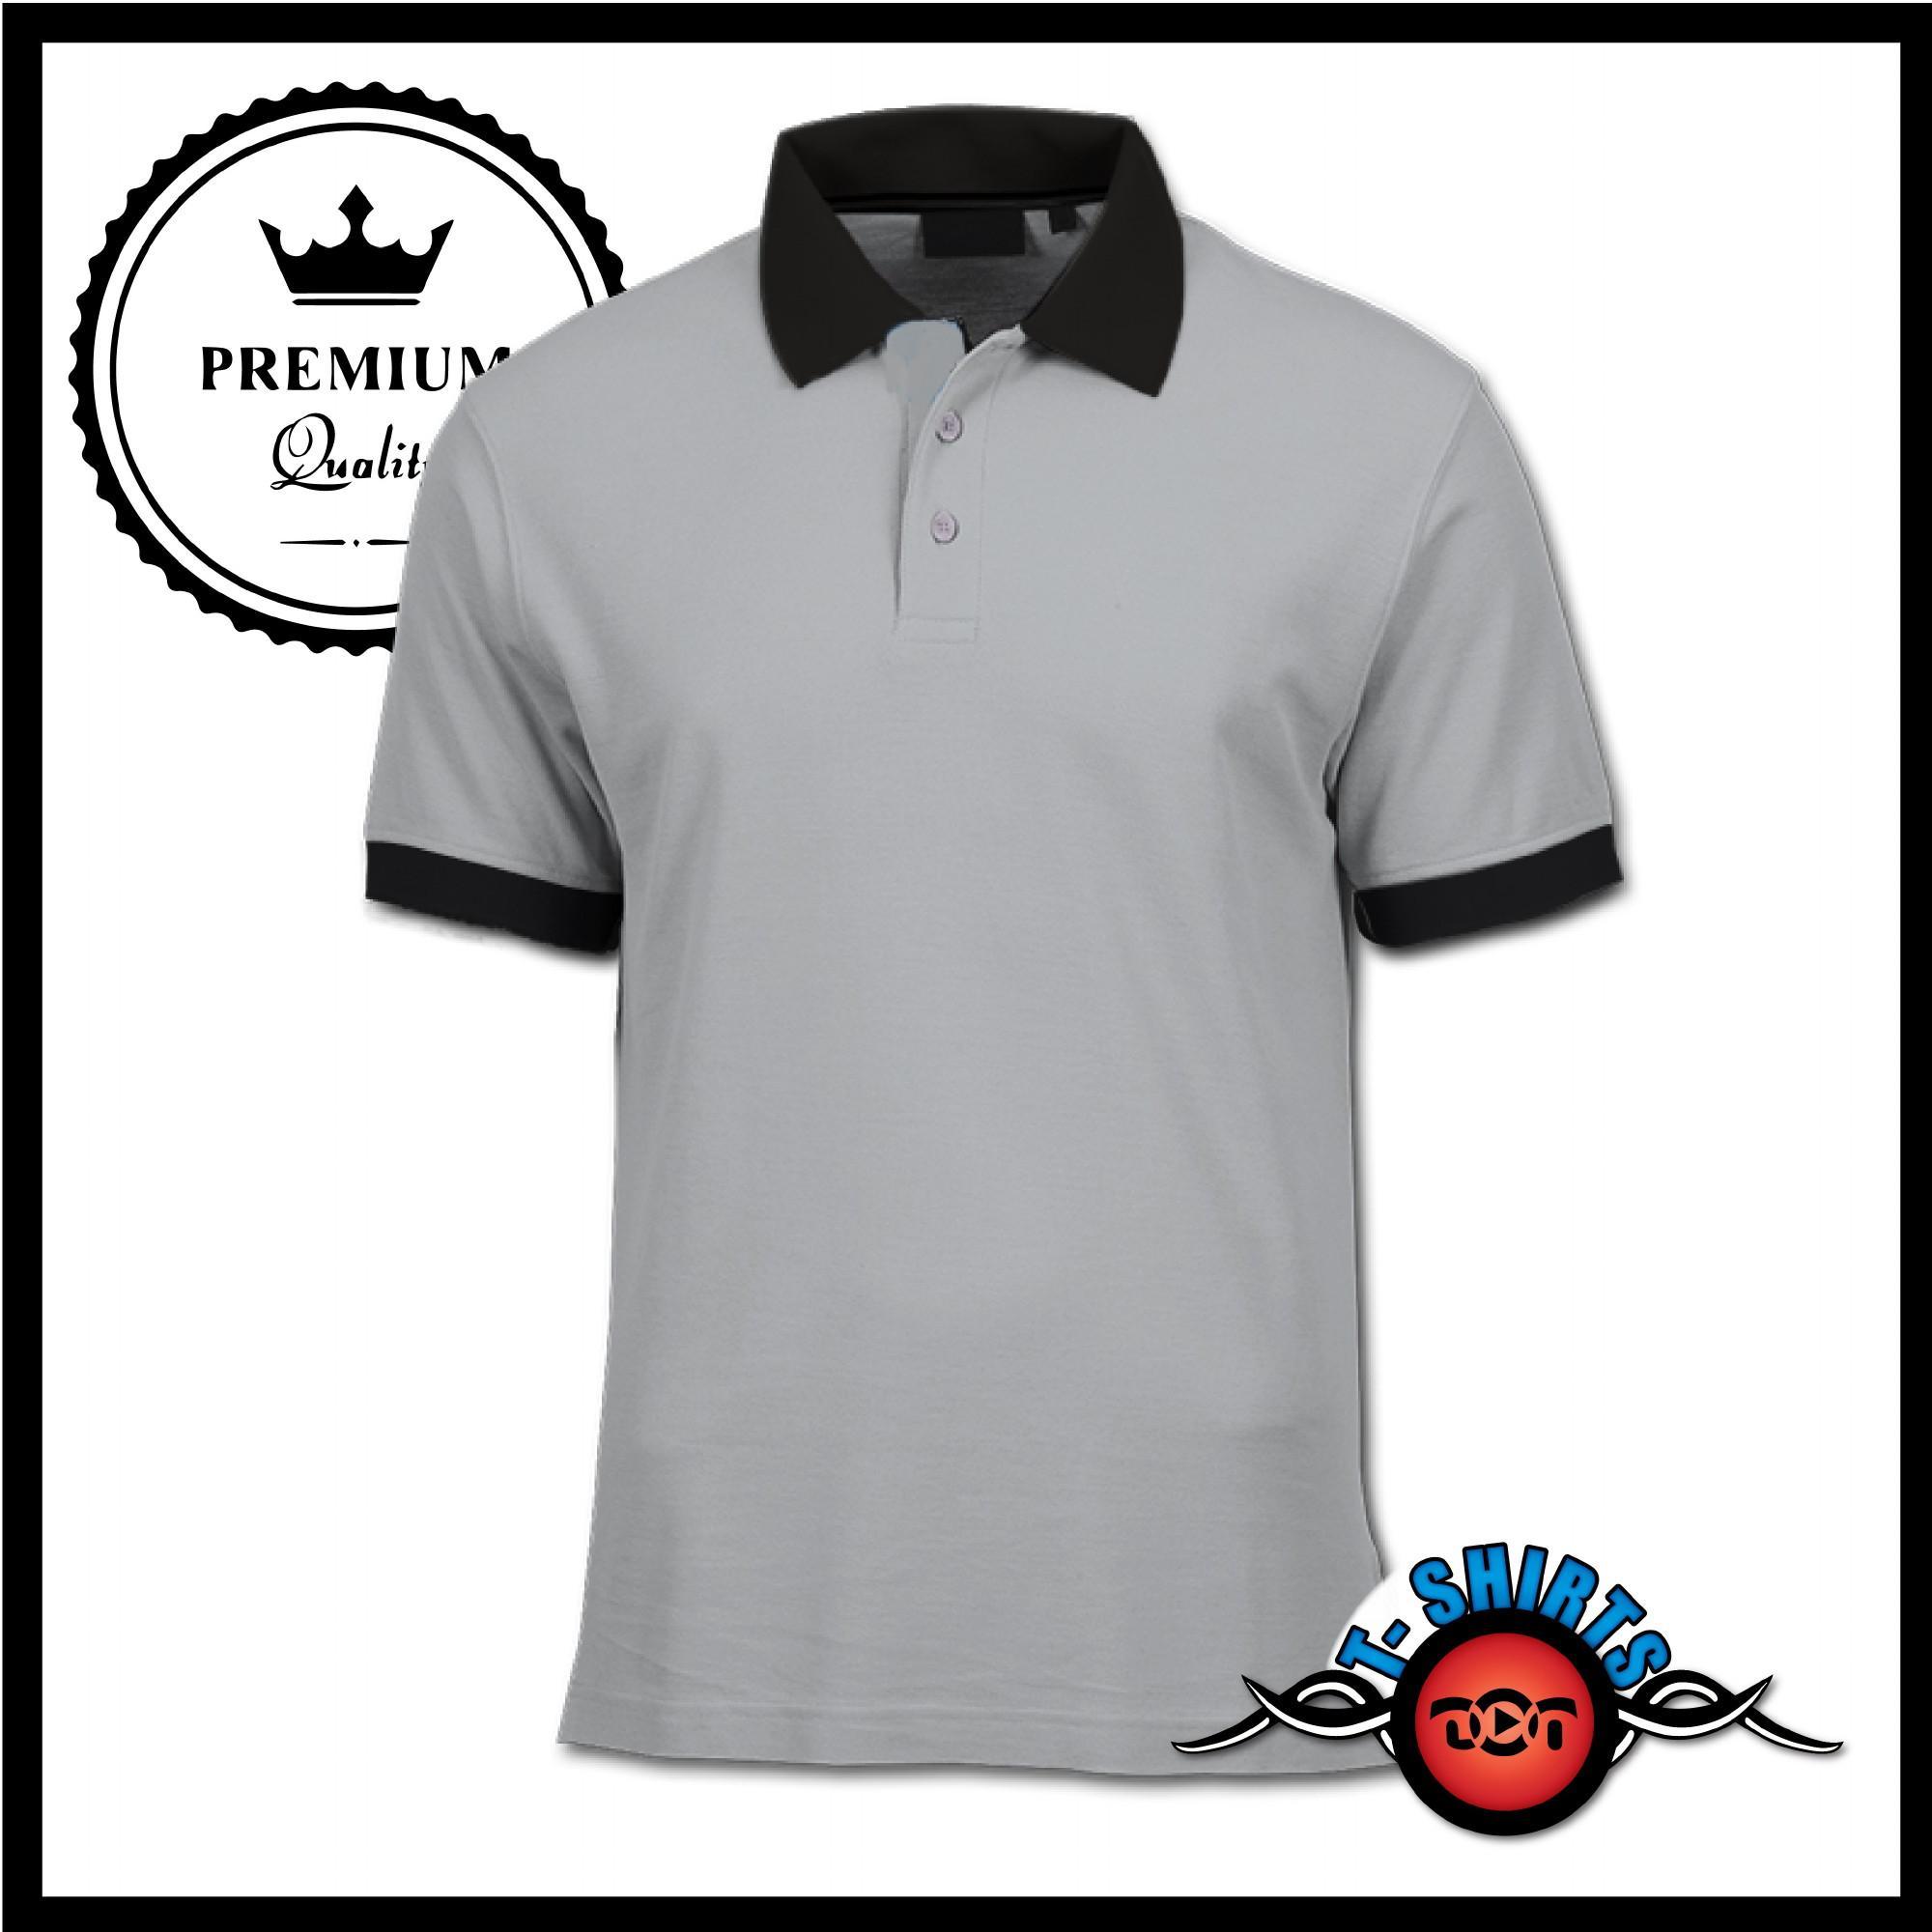 154f3836e Men's Polo T Shirts In Bangladesh At Best Price - Daraz.com.bd